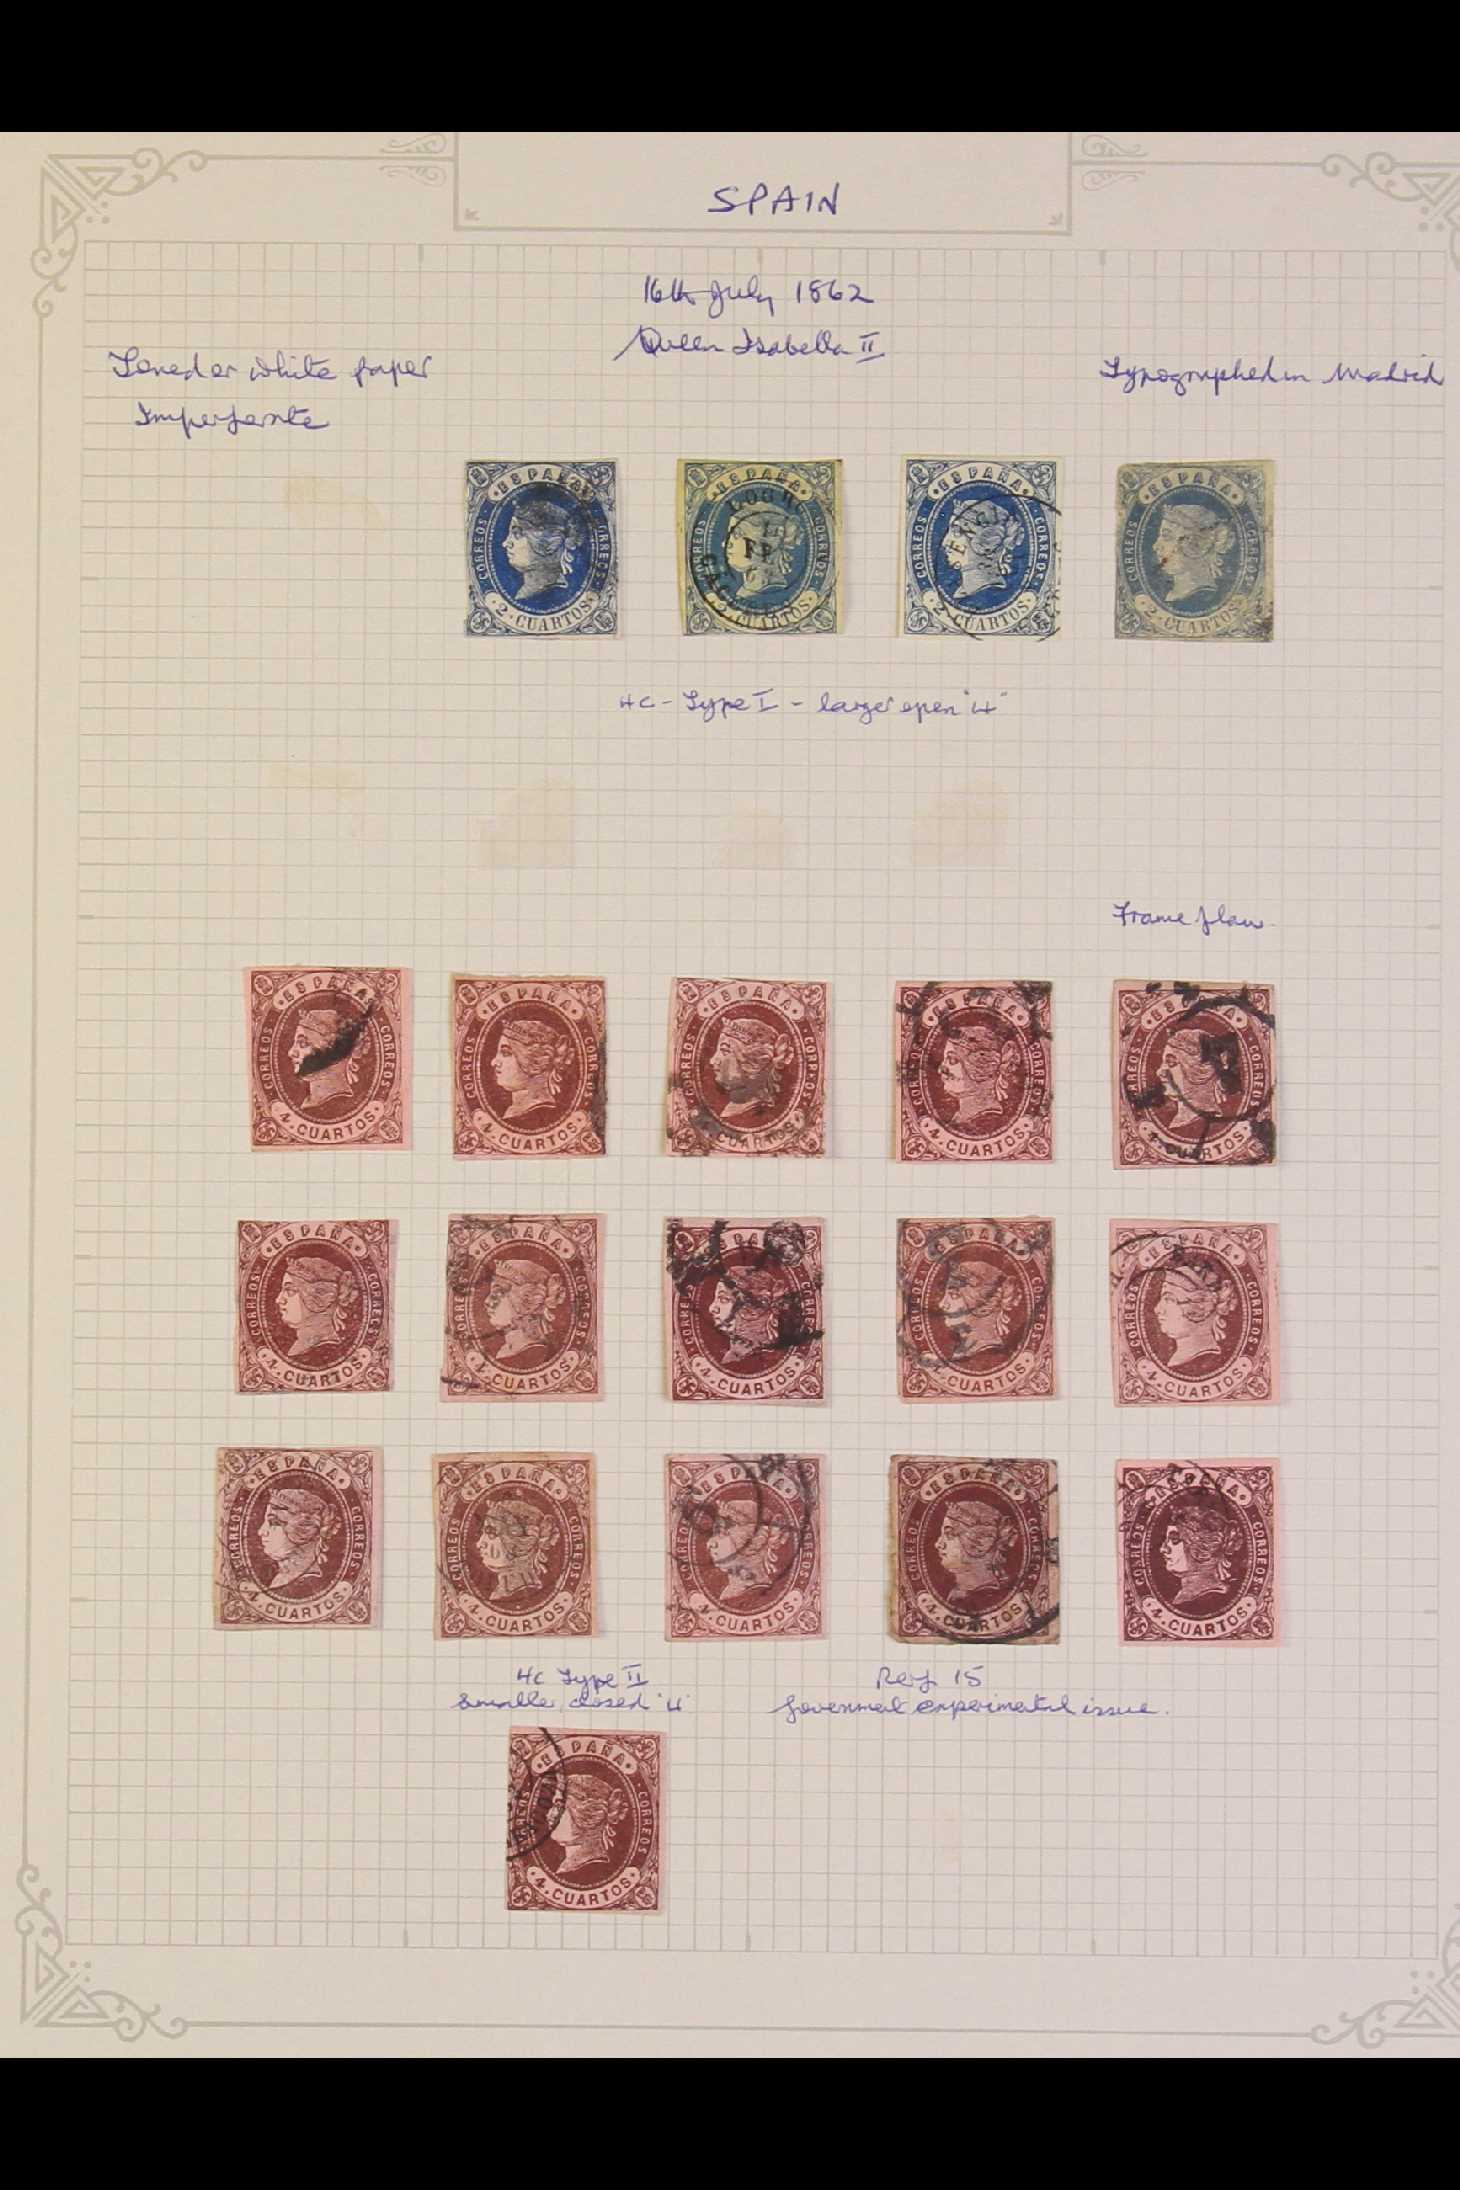 SPAIN 1862 Isabella range with2c blue x4, 4c brown on brown x16, 12c blue on rose x10, 19c